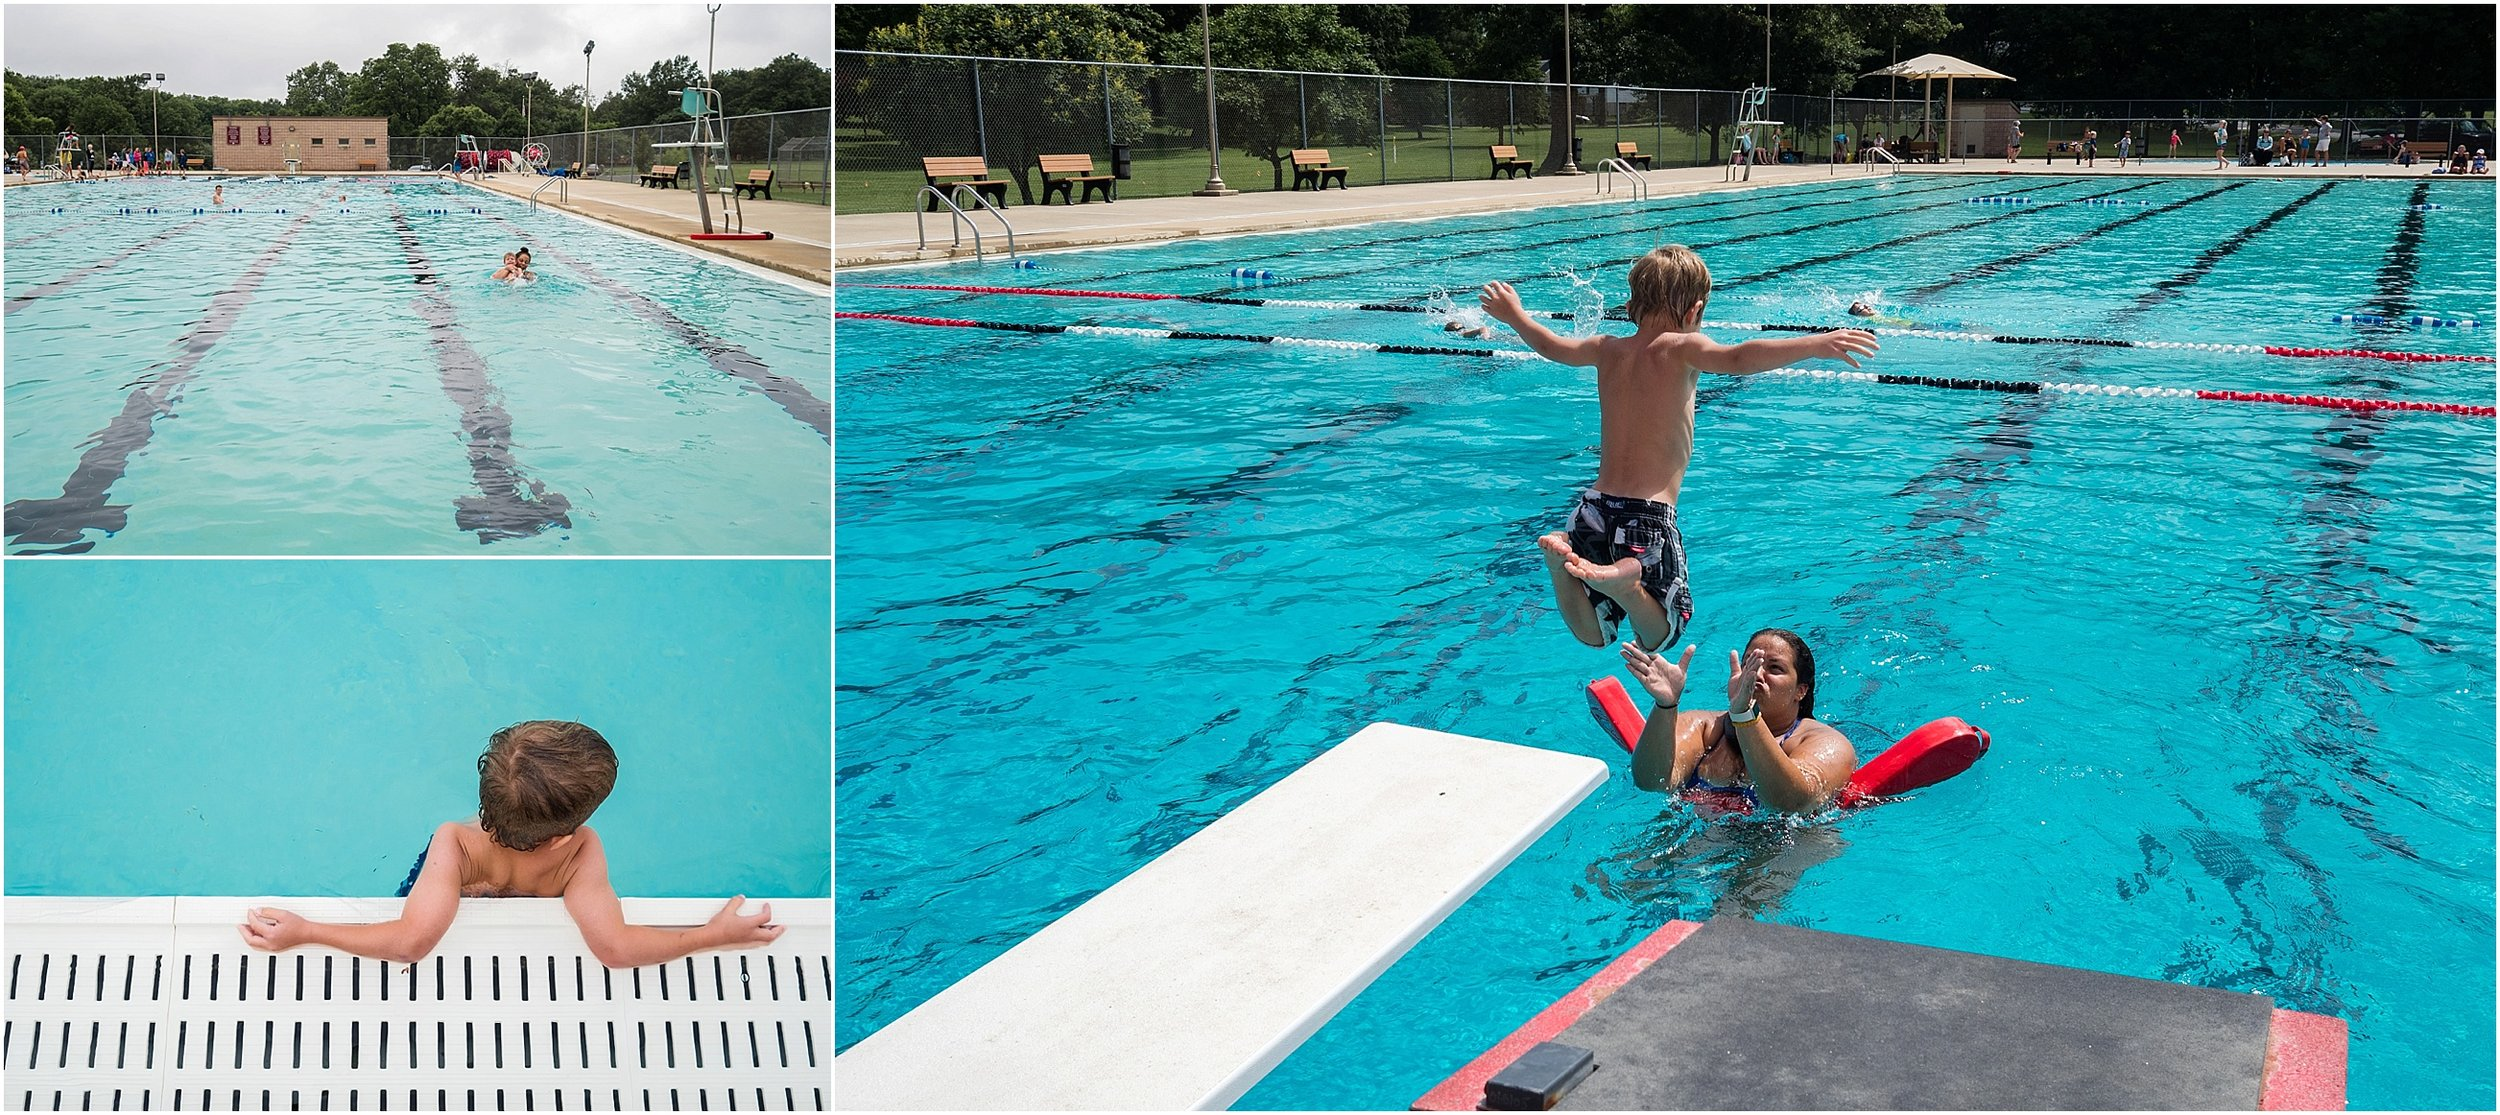 swimming pool, sumertime, boy